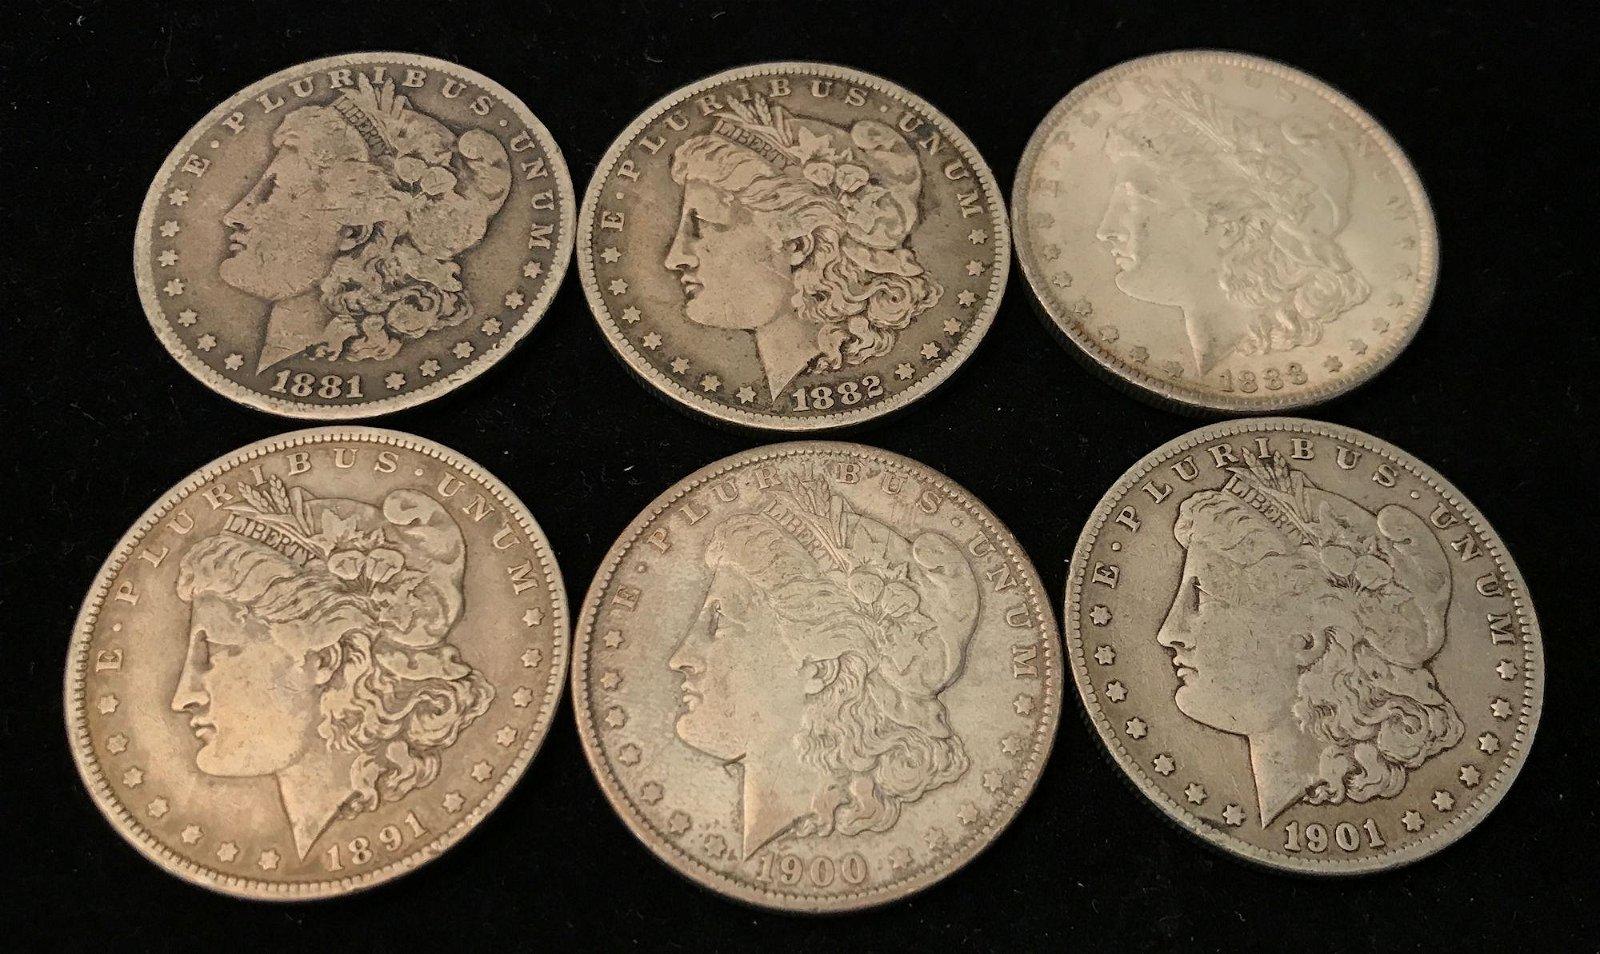 6 MORGAN SILVER DOLLARS INCLUDING 1881O, 1882O, 1888,